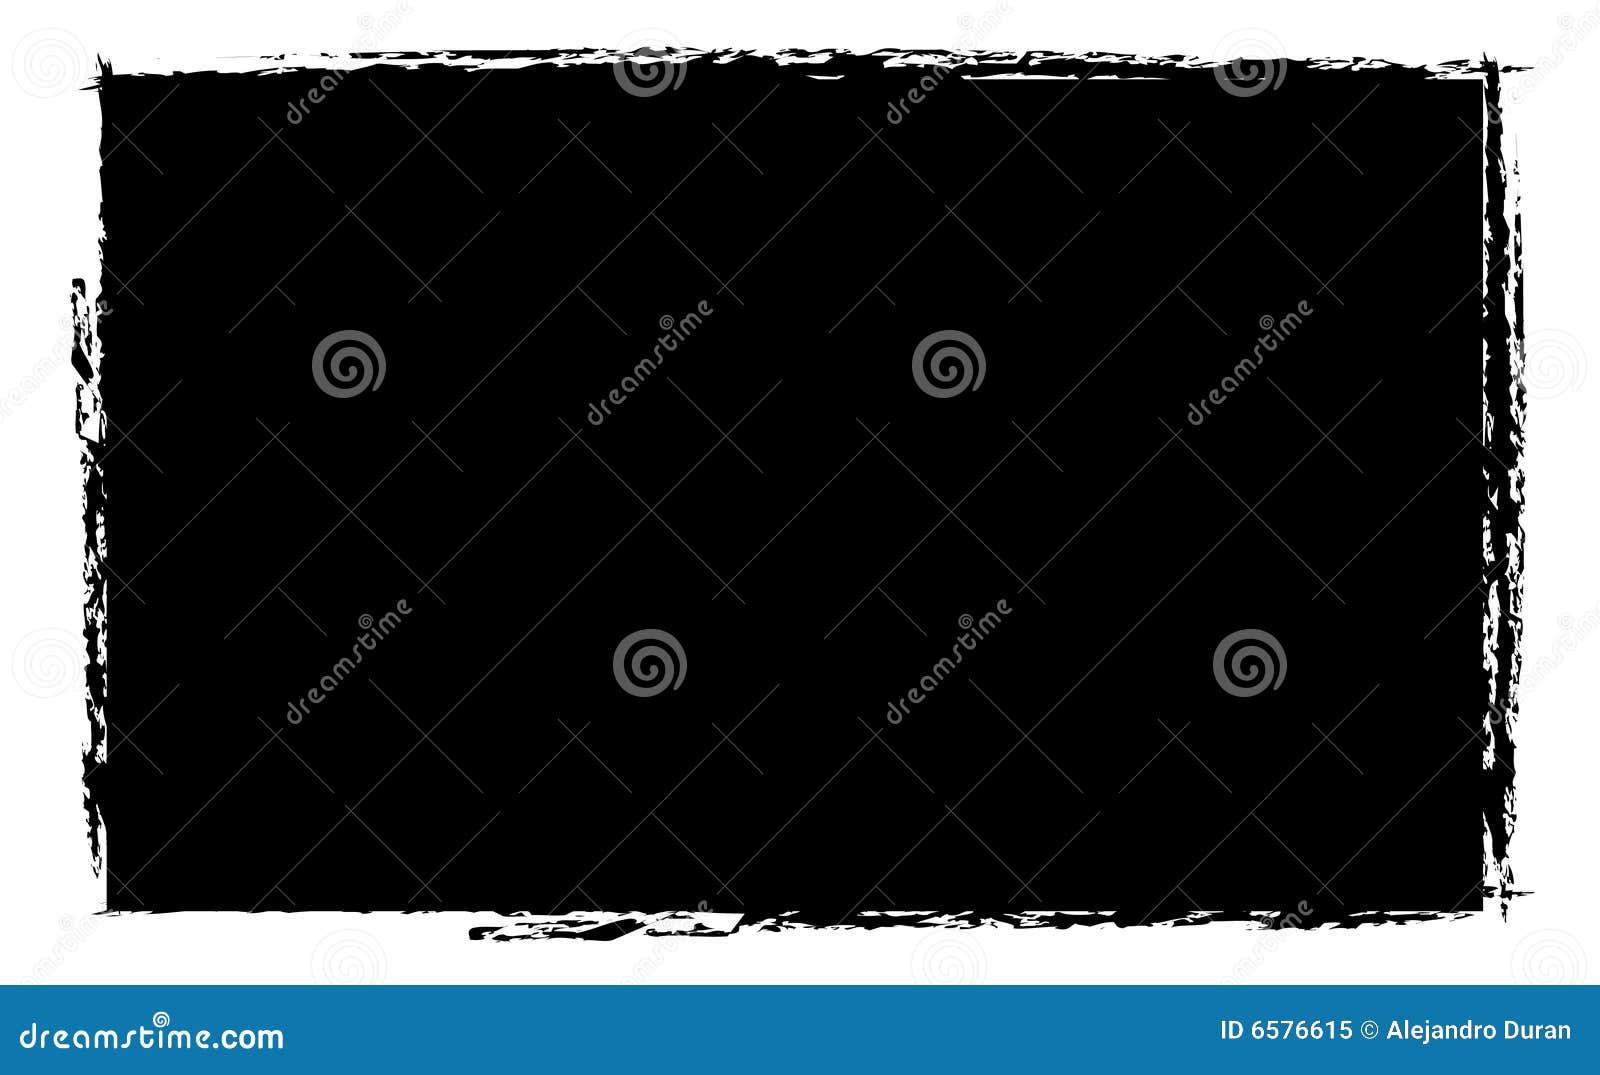 Grunge Camera Vector : Photo grunge frame stock vector. illustration of camera 6576615